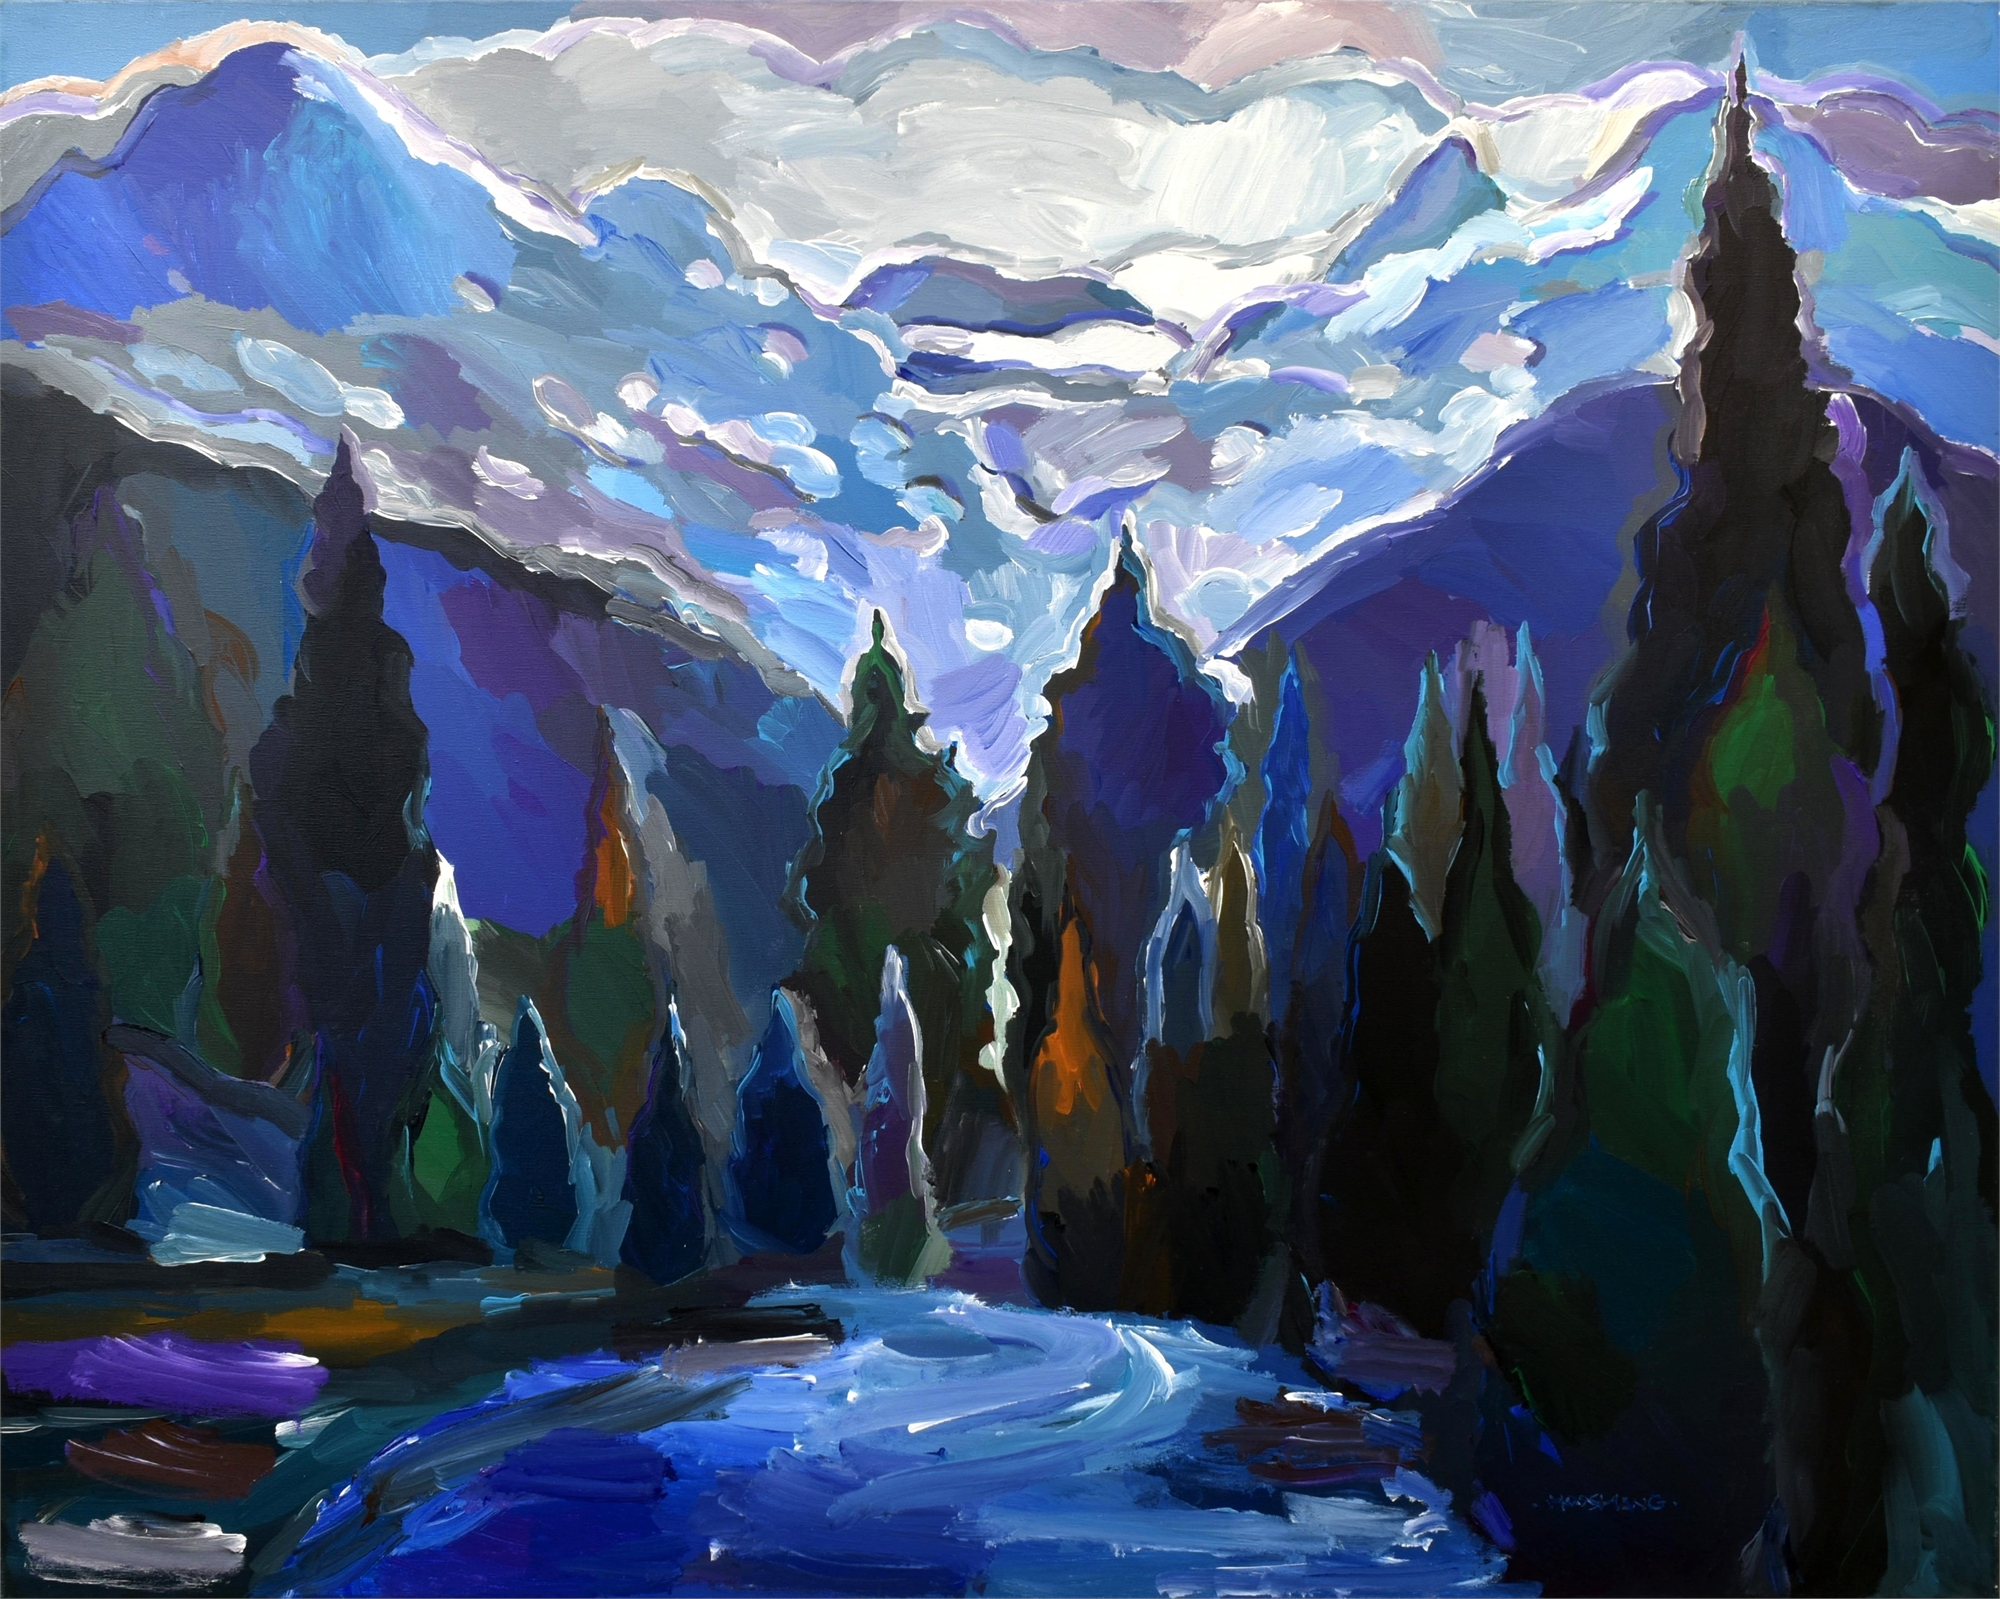 Cascade of Blue by Hooshang Khorasani